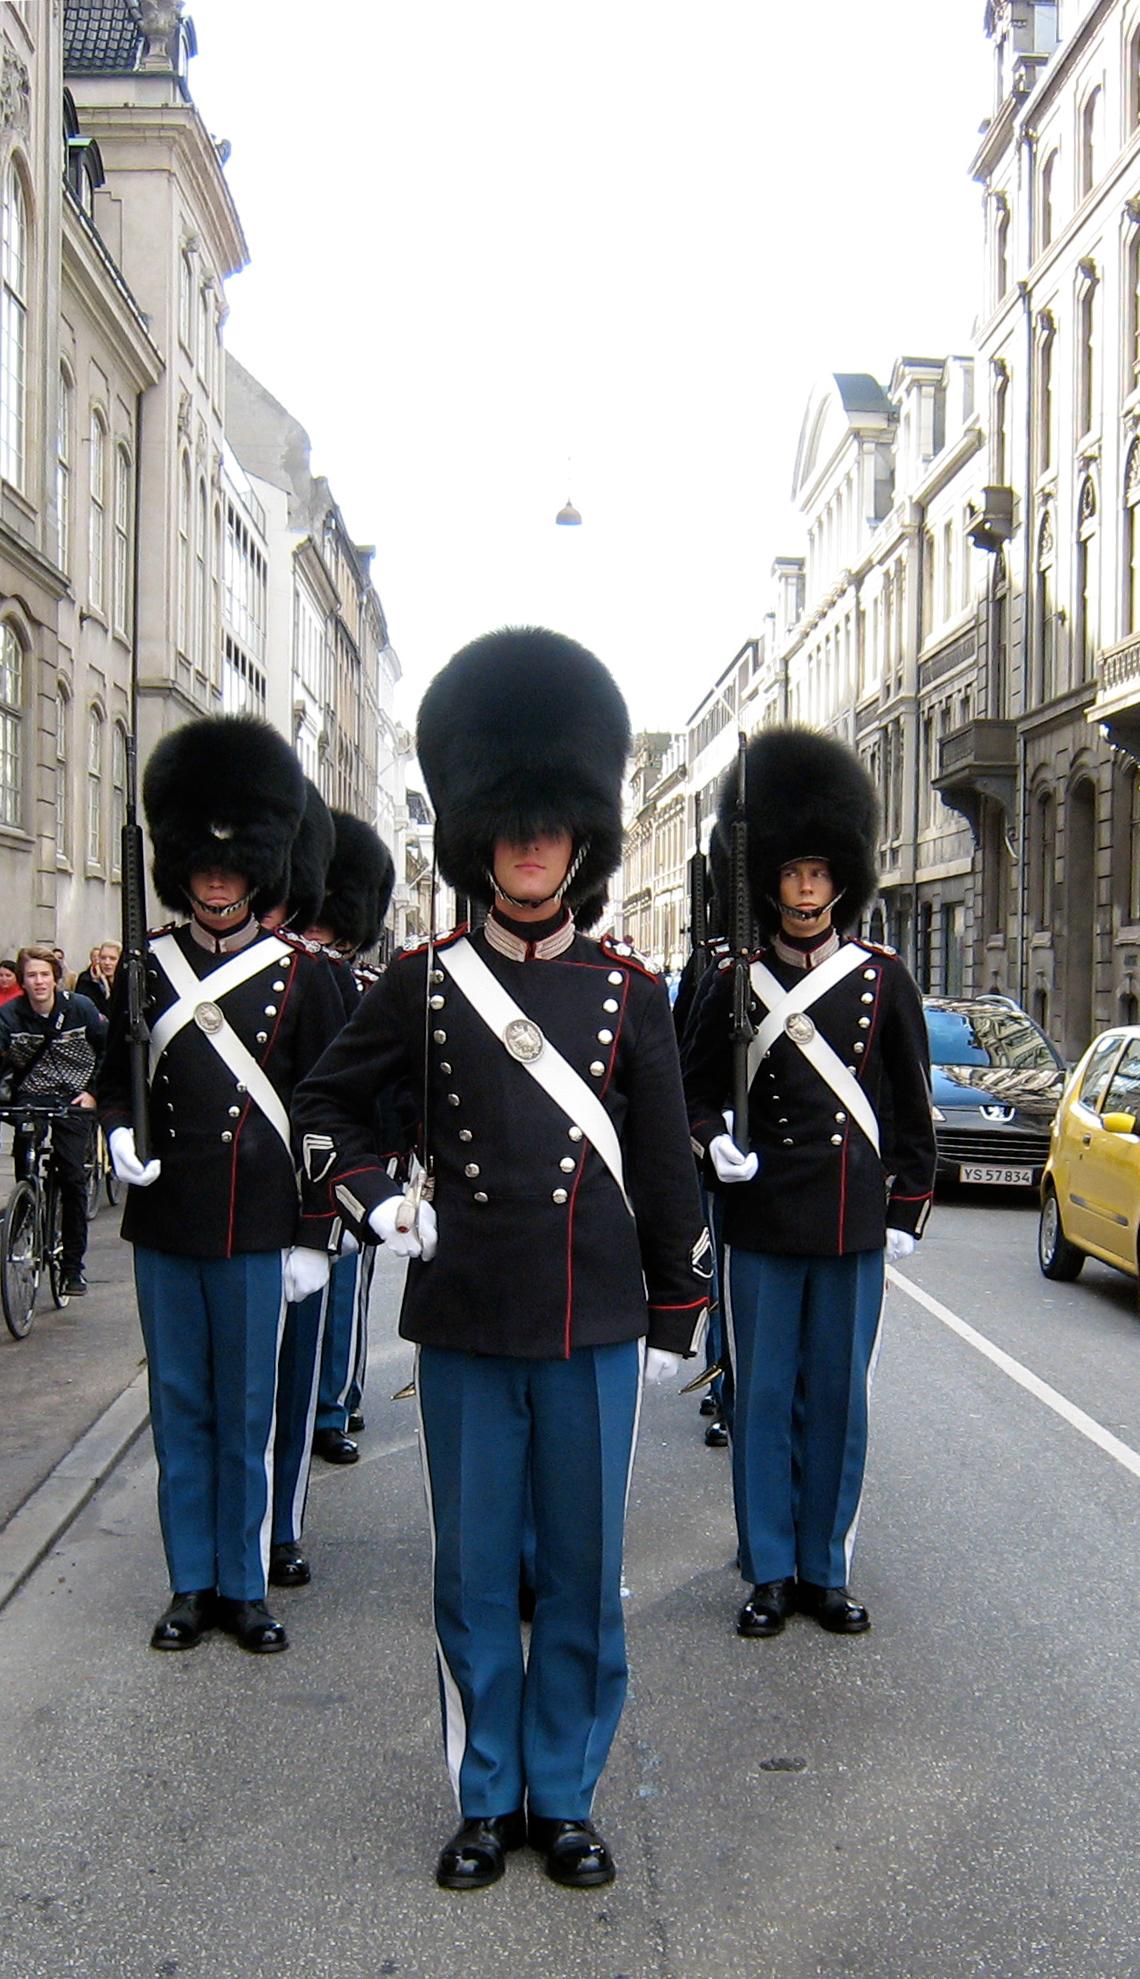 conscription in denmark